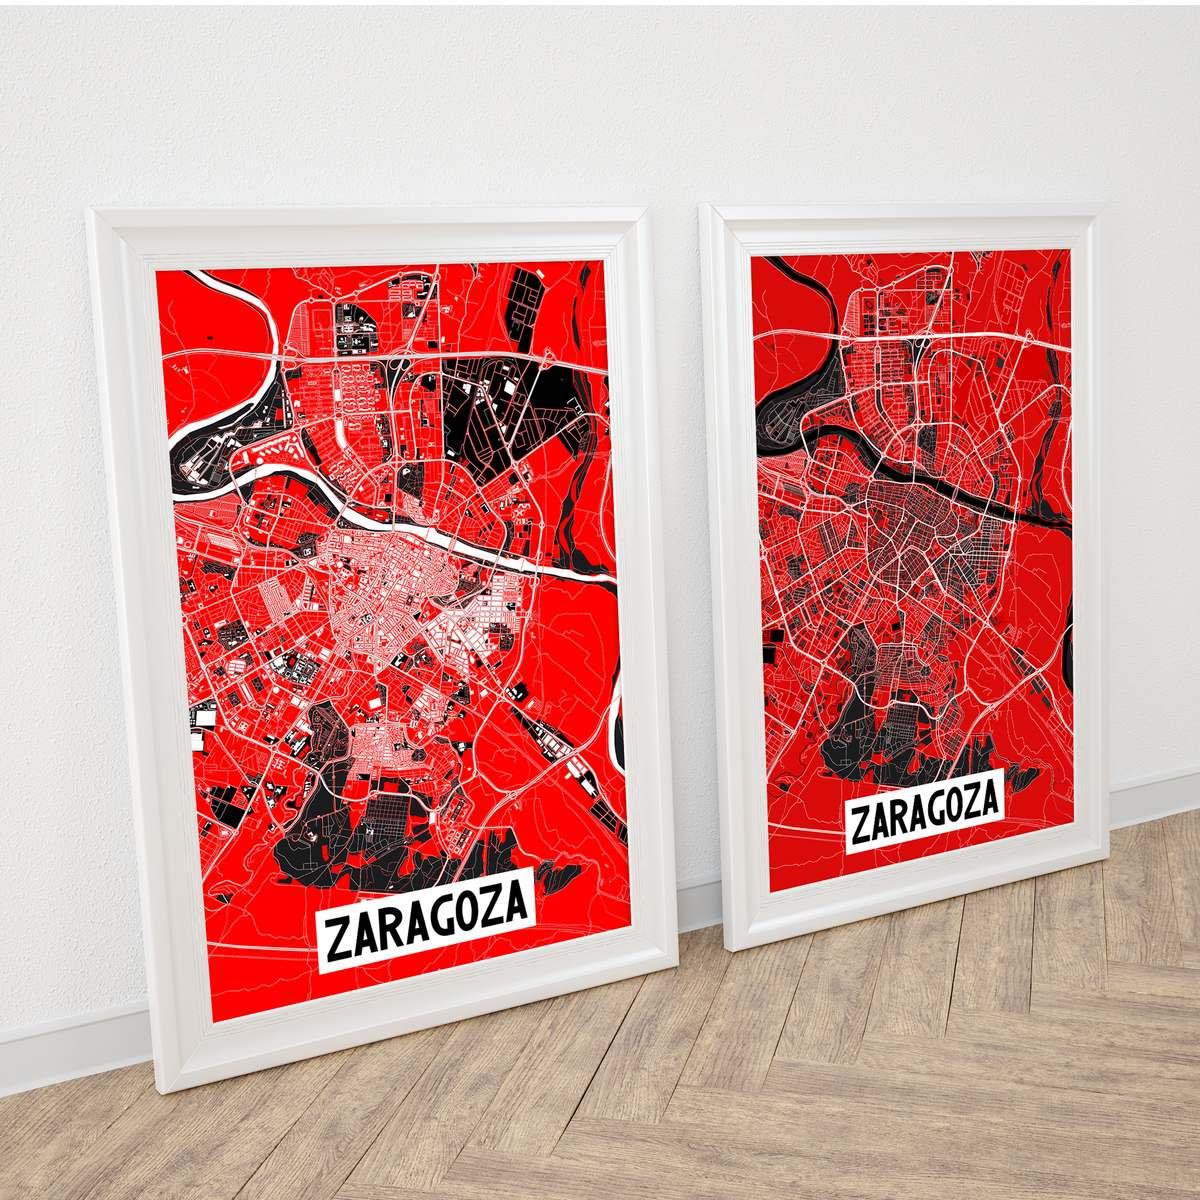 Zaragoza: Fiestas del Pilar 2018. Poster edición limitada.